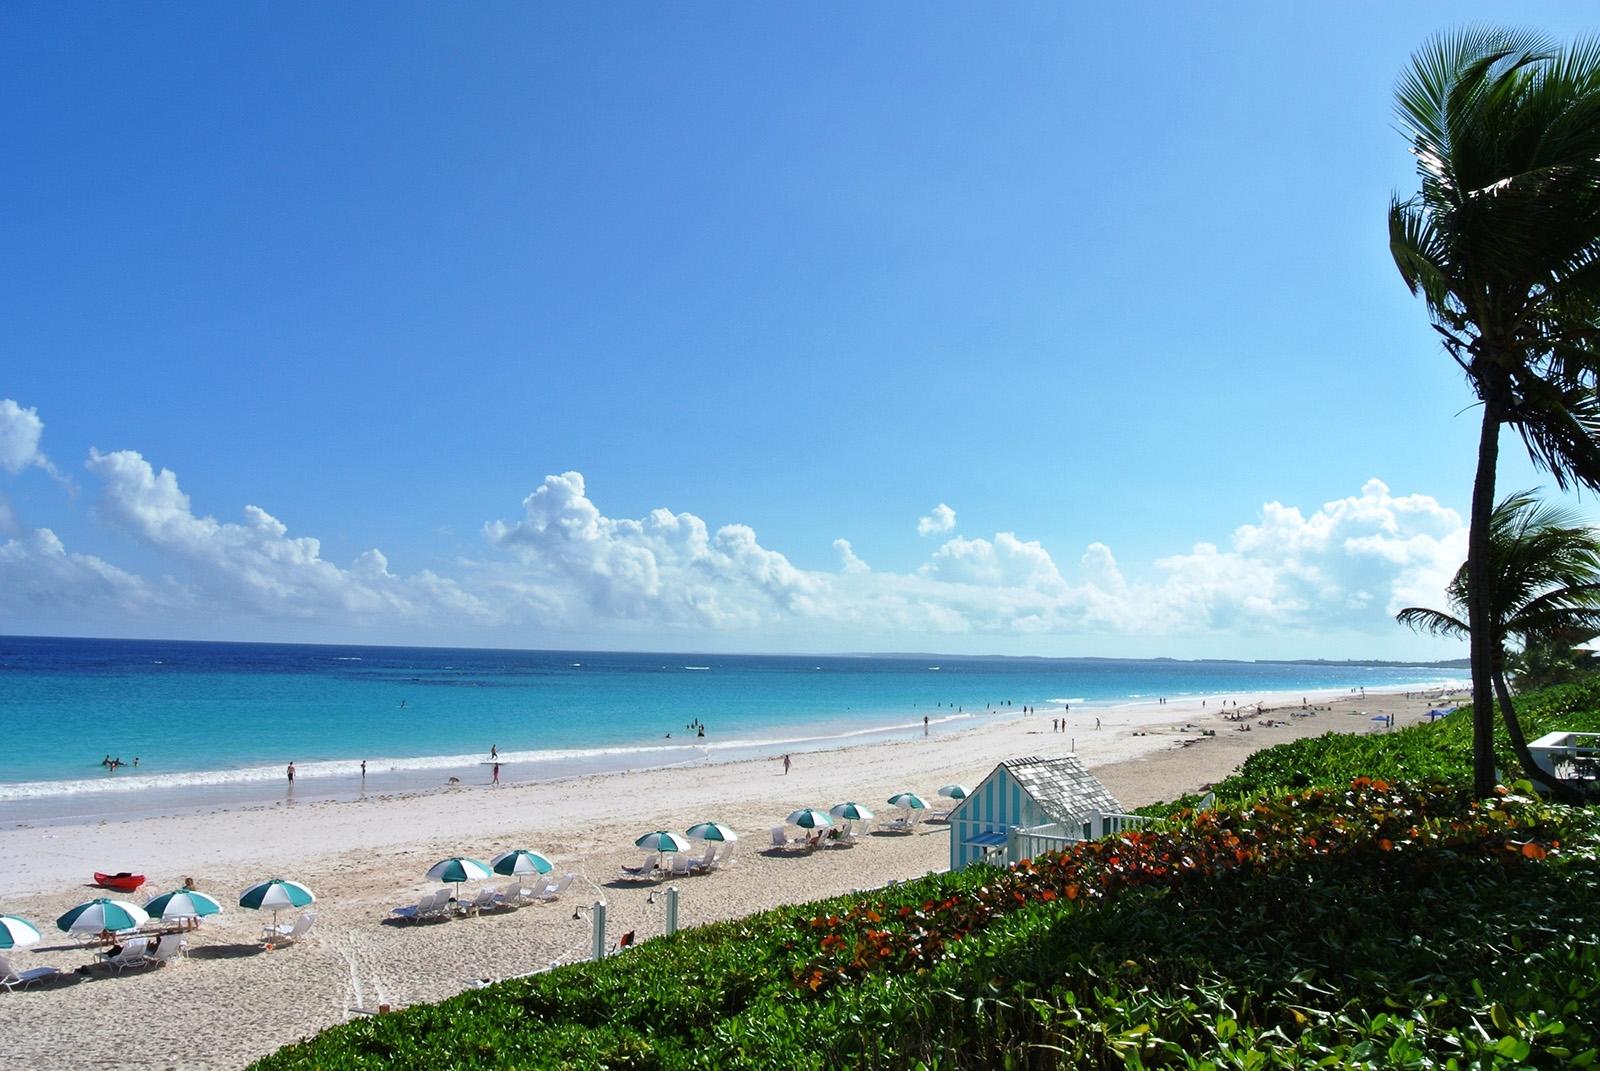 Розовый пляж харбор на багамах